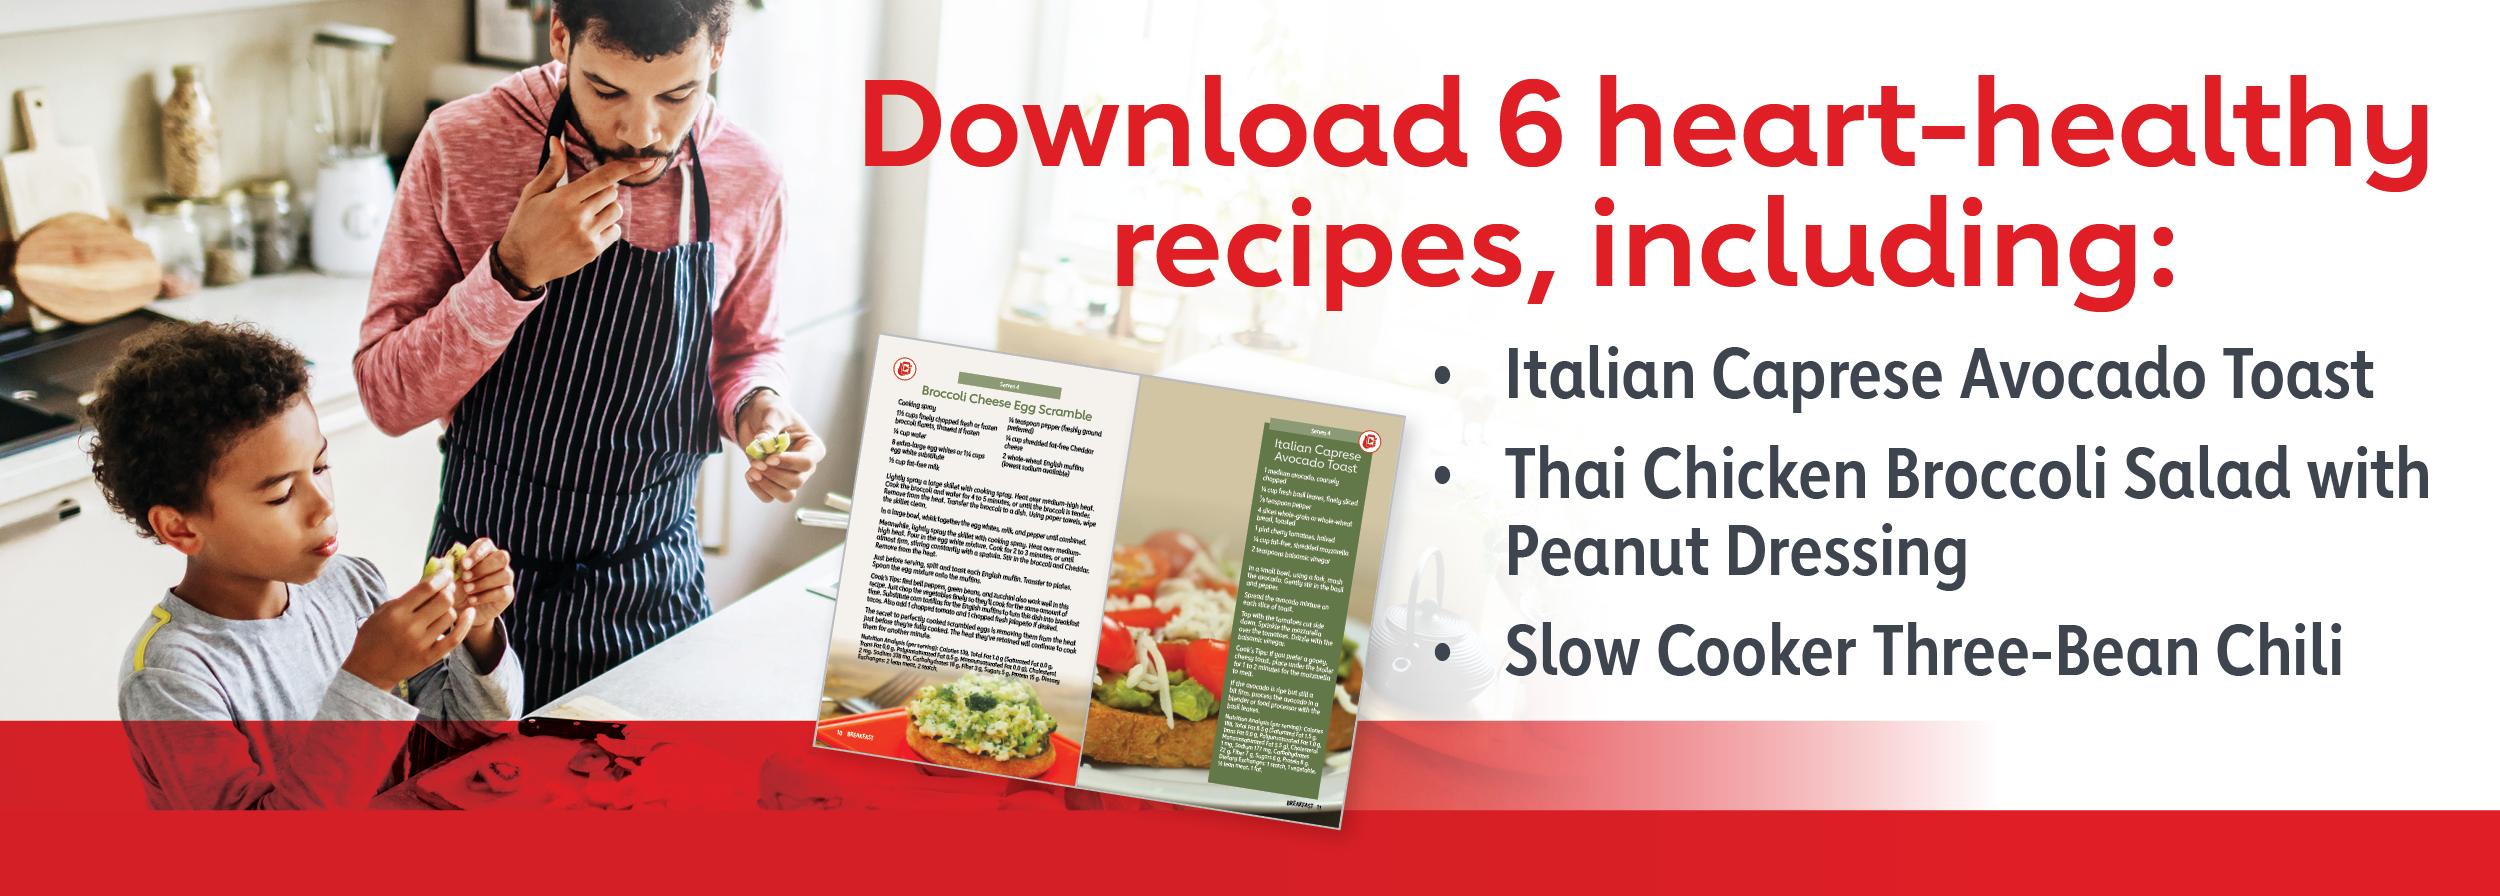 Download 6 heart-healthy recipes